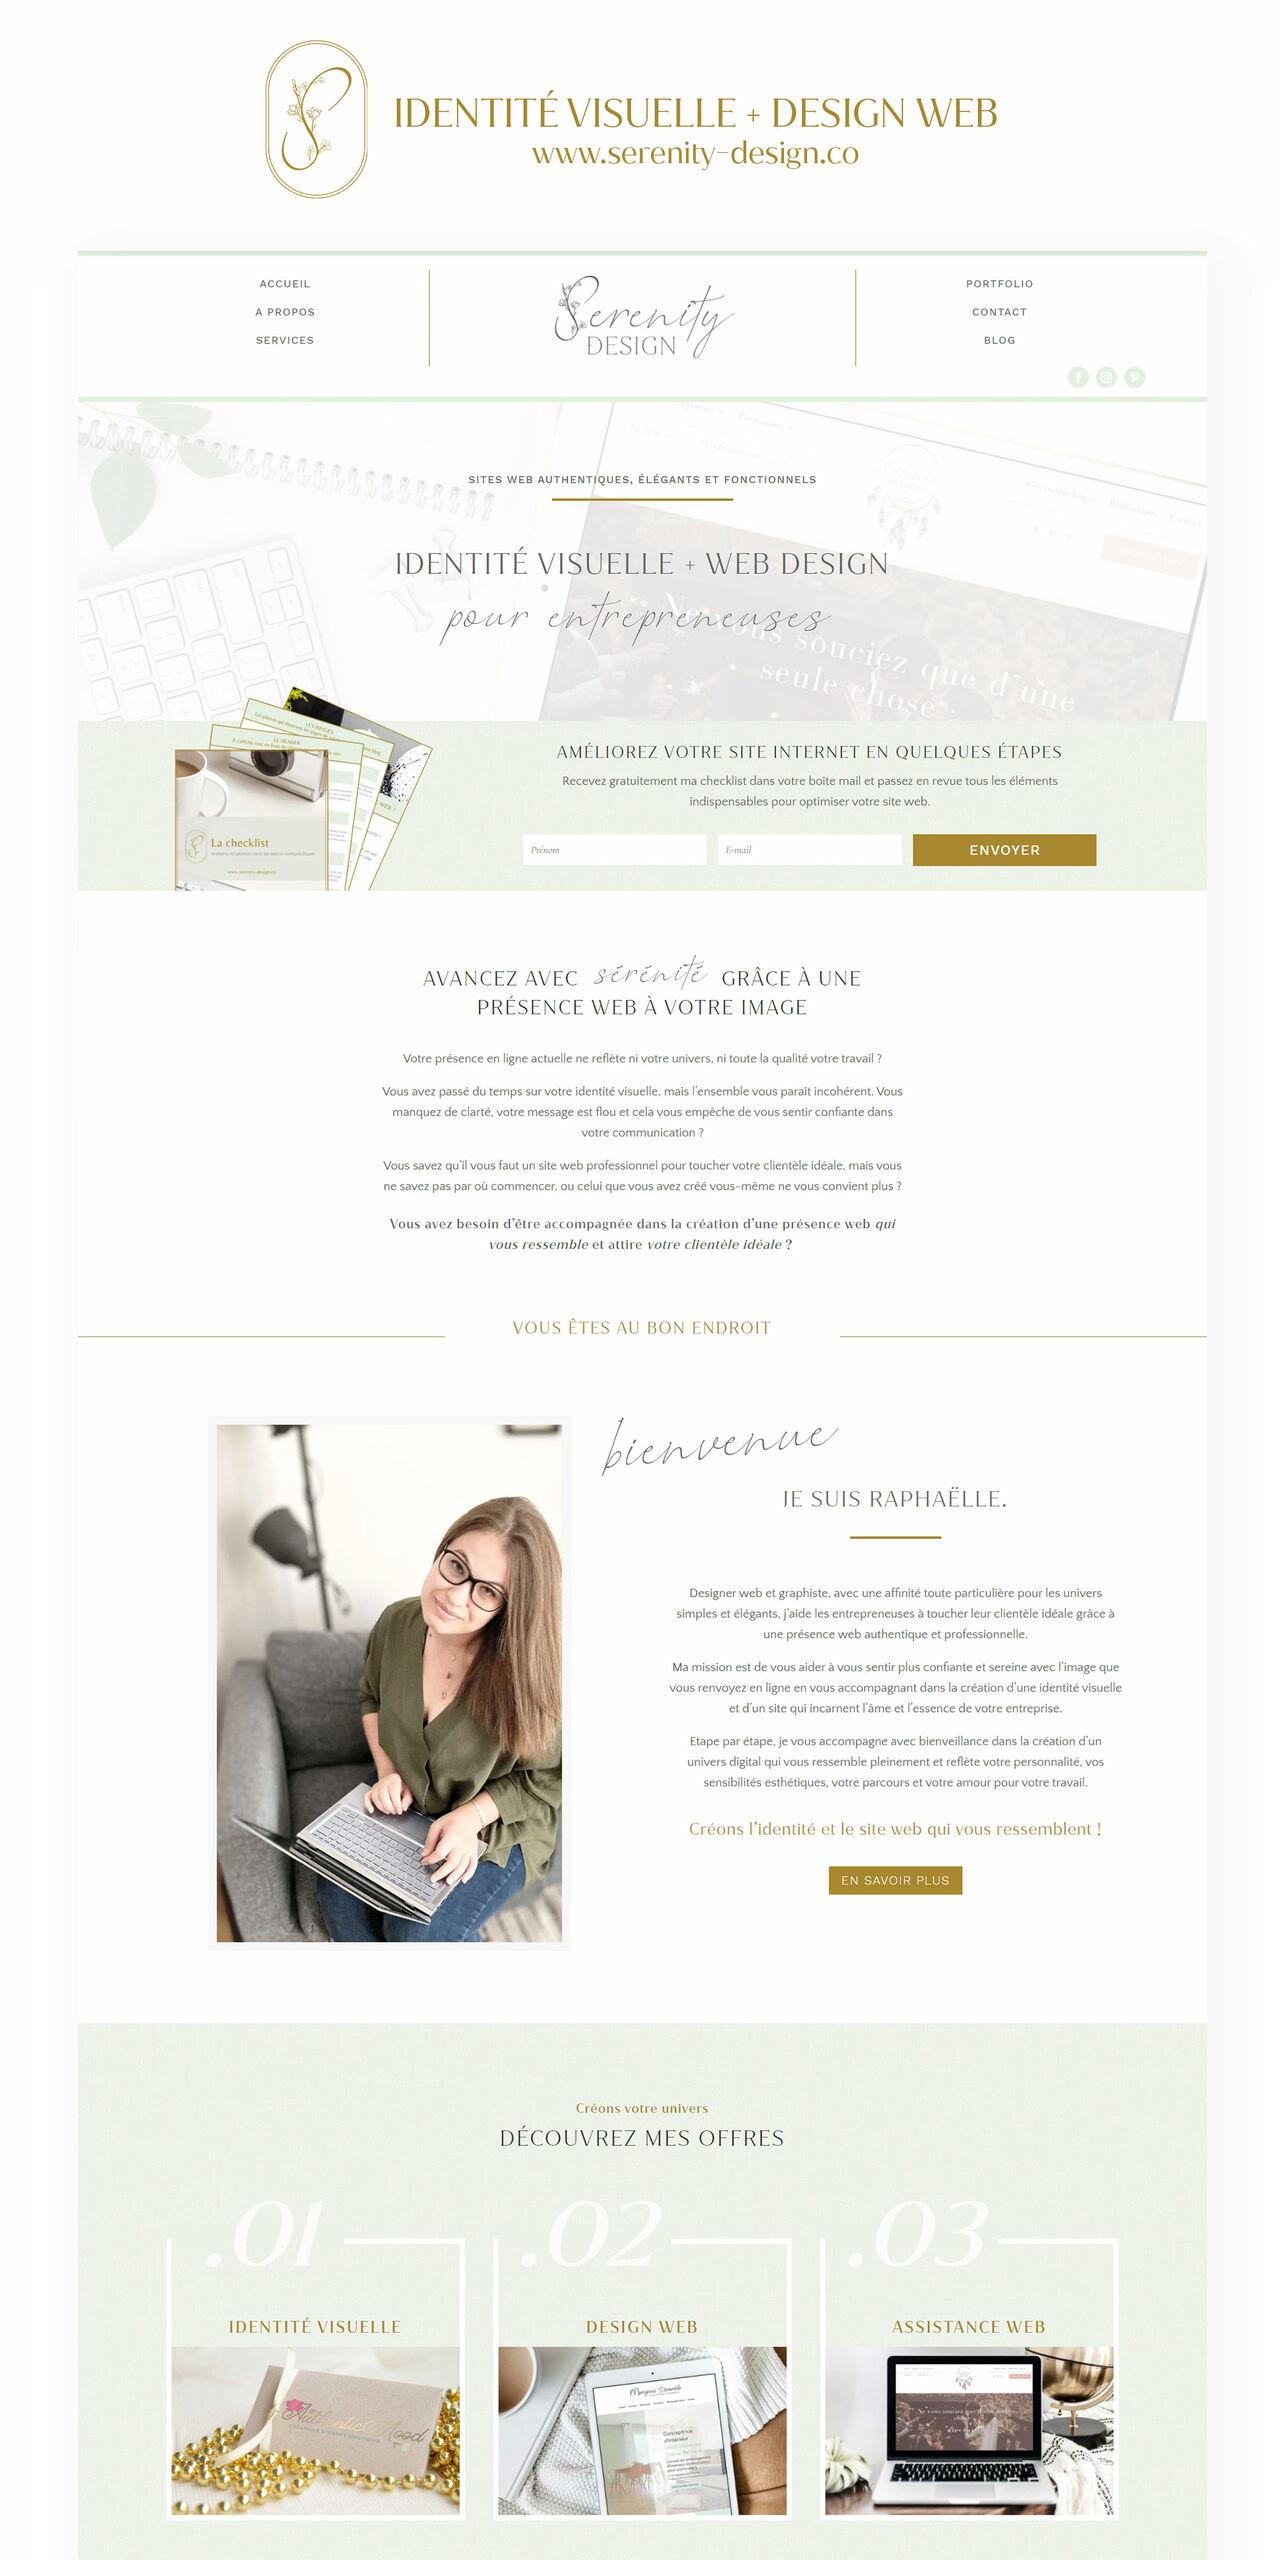 Design web - Serenity Design - Webdesigner